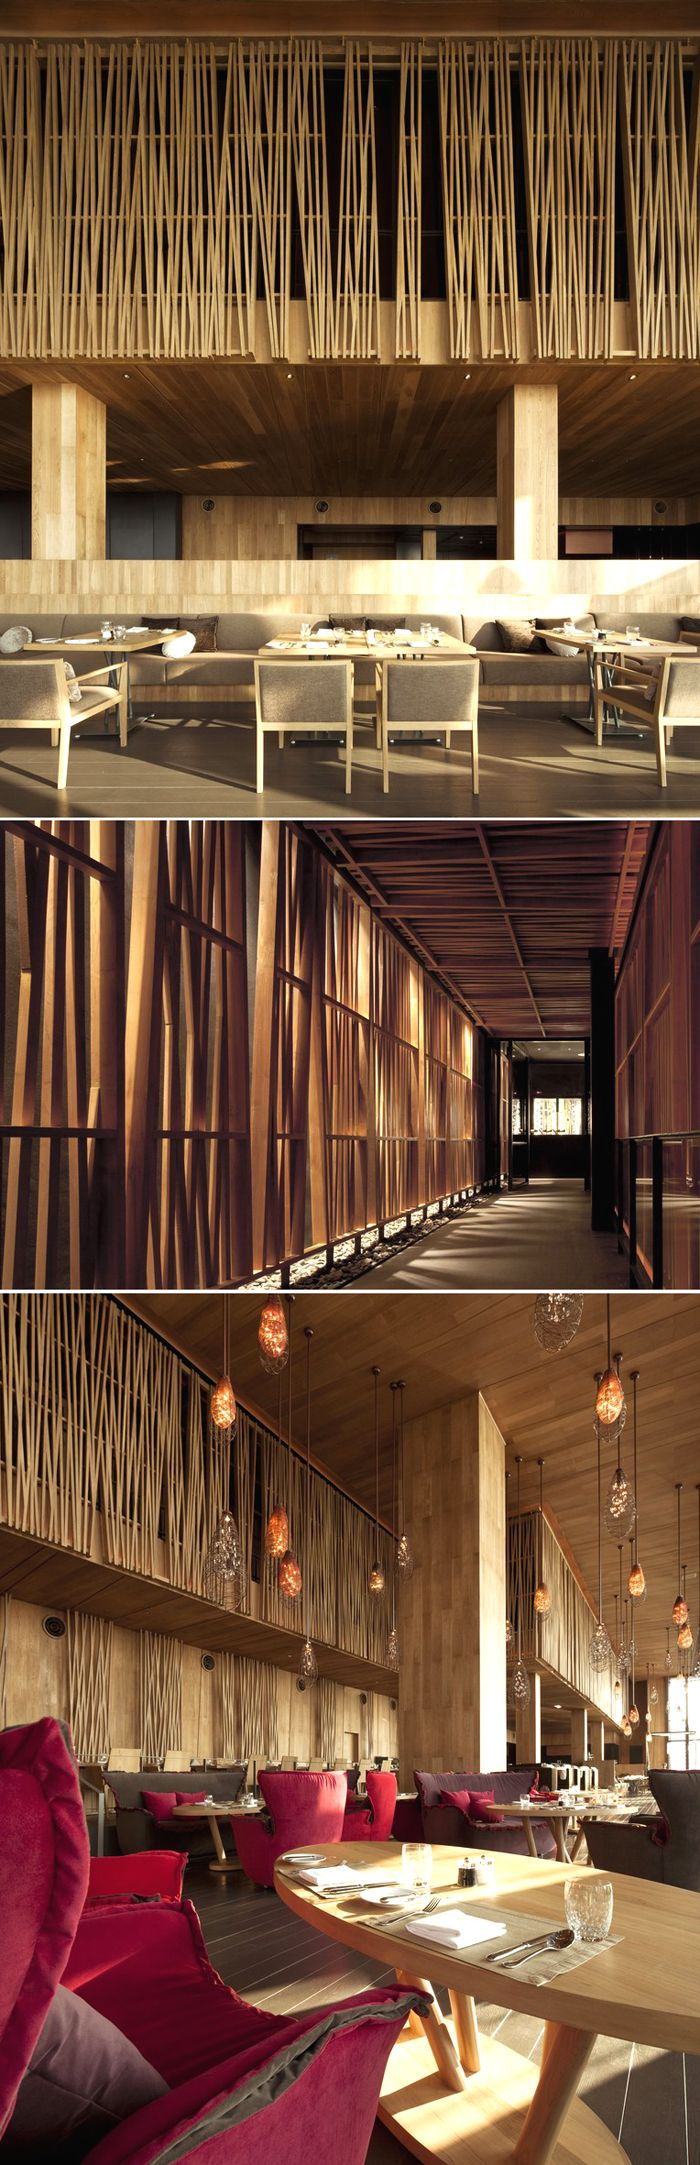 Edge_Hilton Pattaya_Department of Architecture....